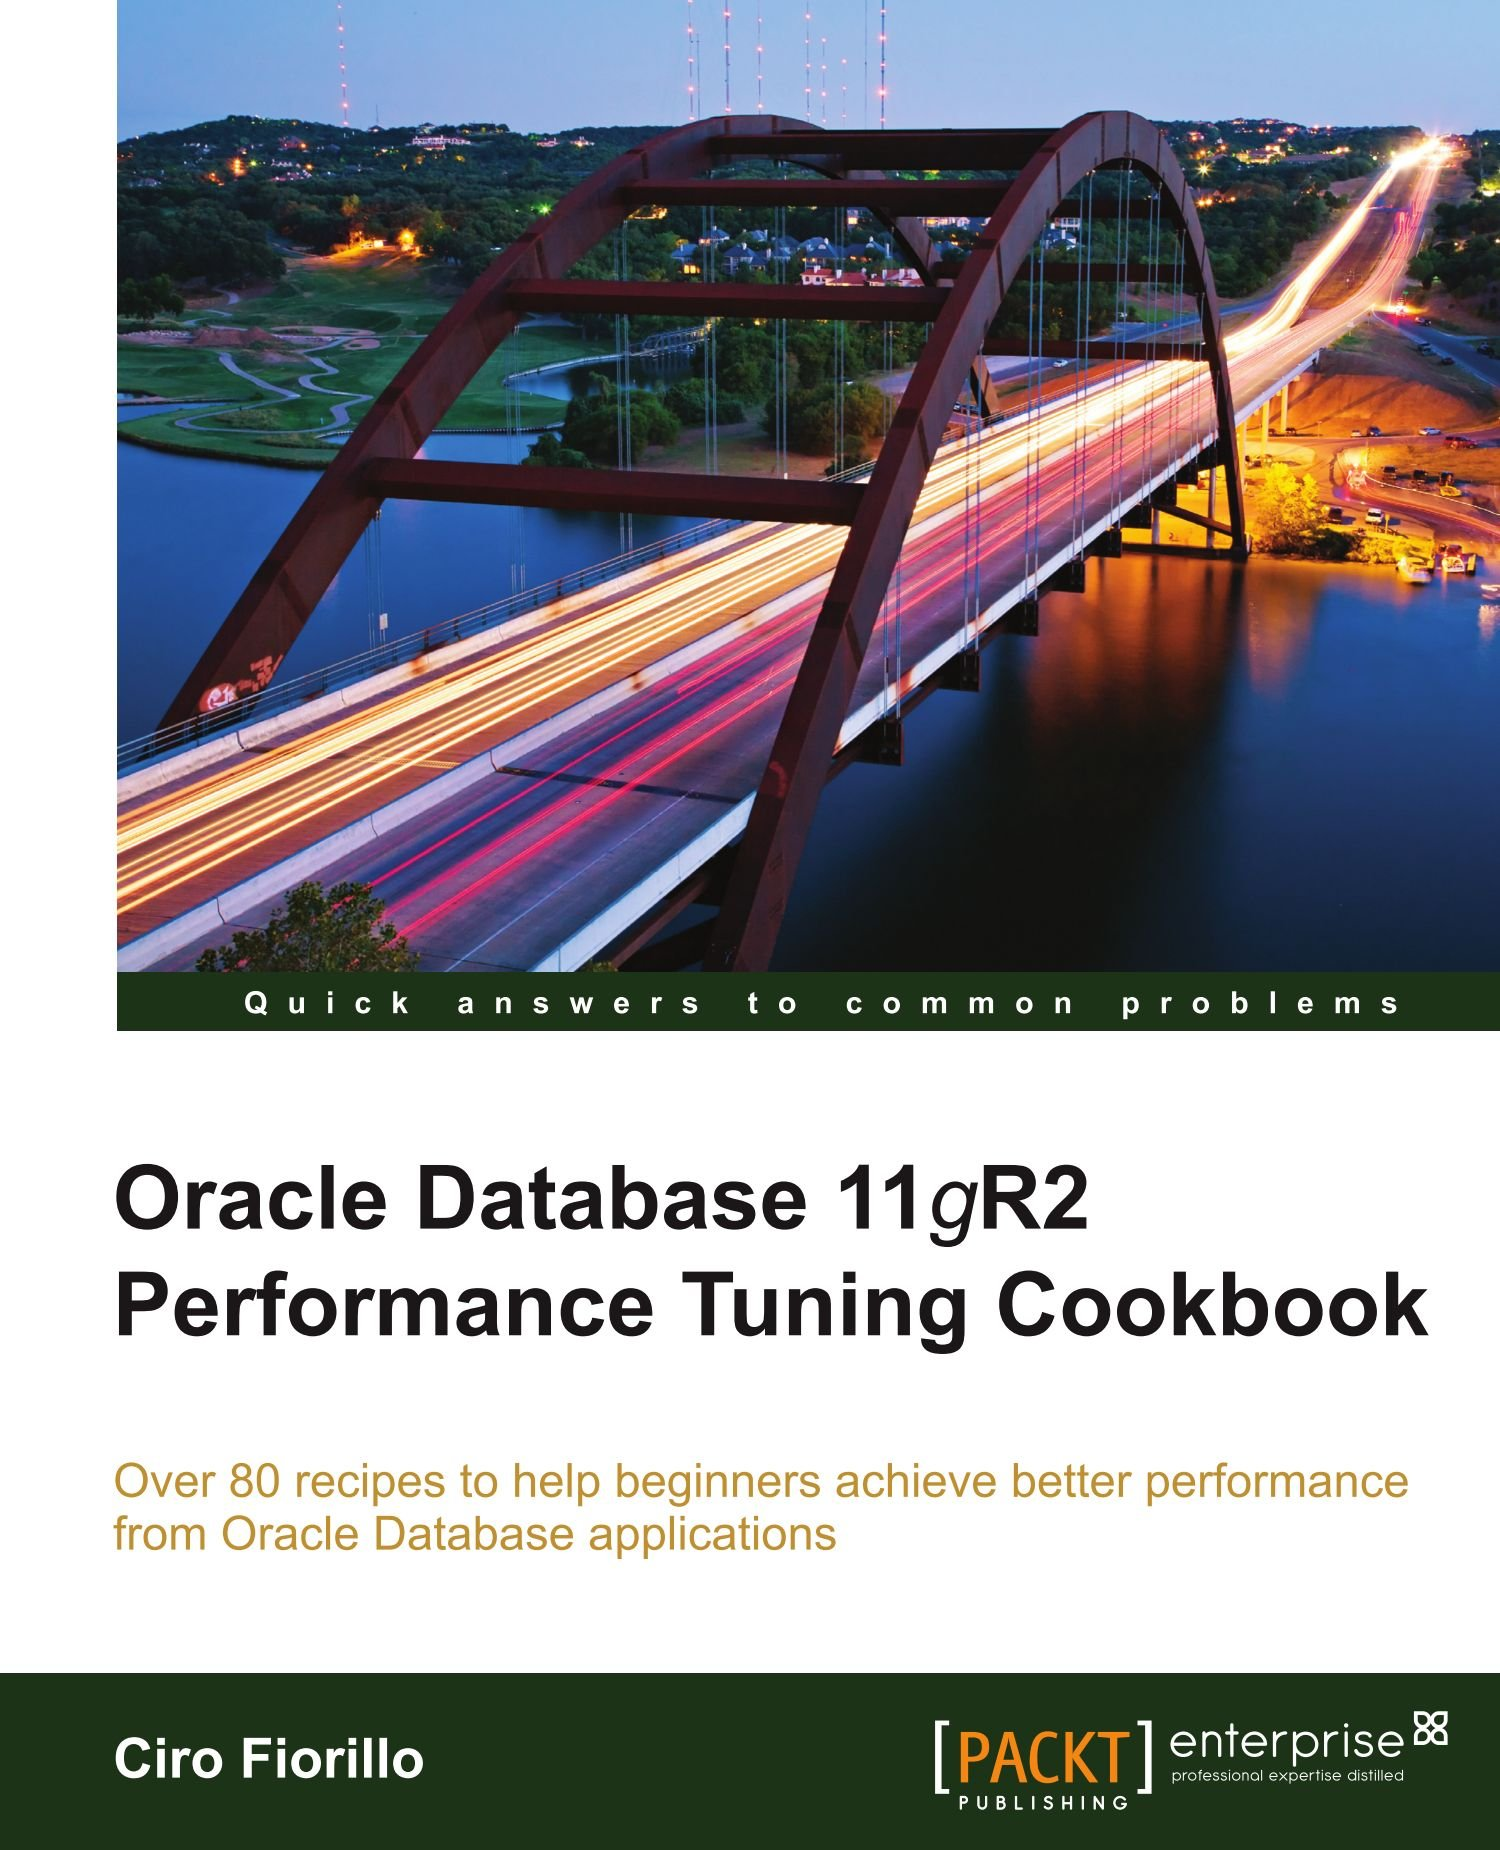 Oracle Database 11gR2 Performance Tuning Cookbook: Ciro Fiorillo ...